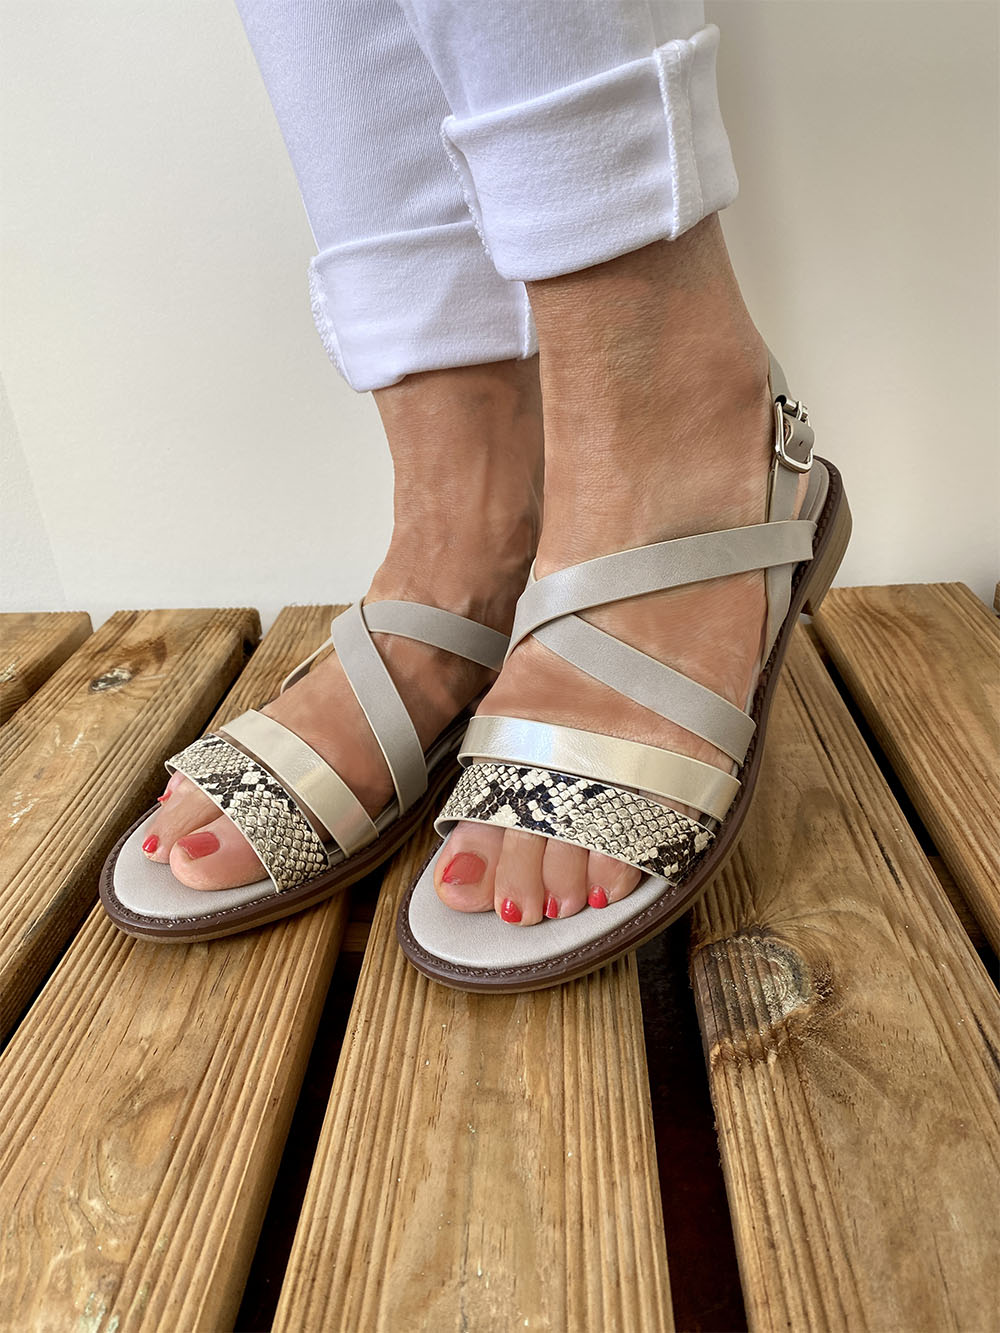 Shoe image  Main